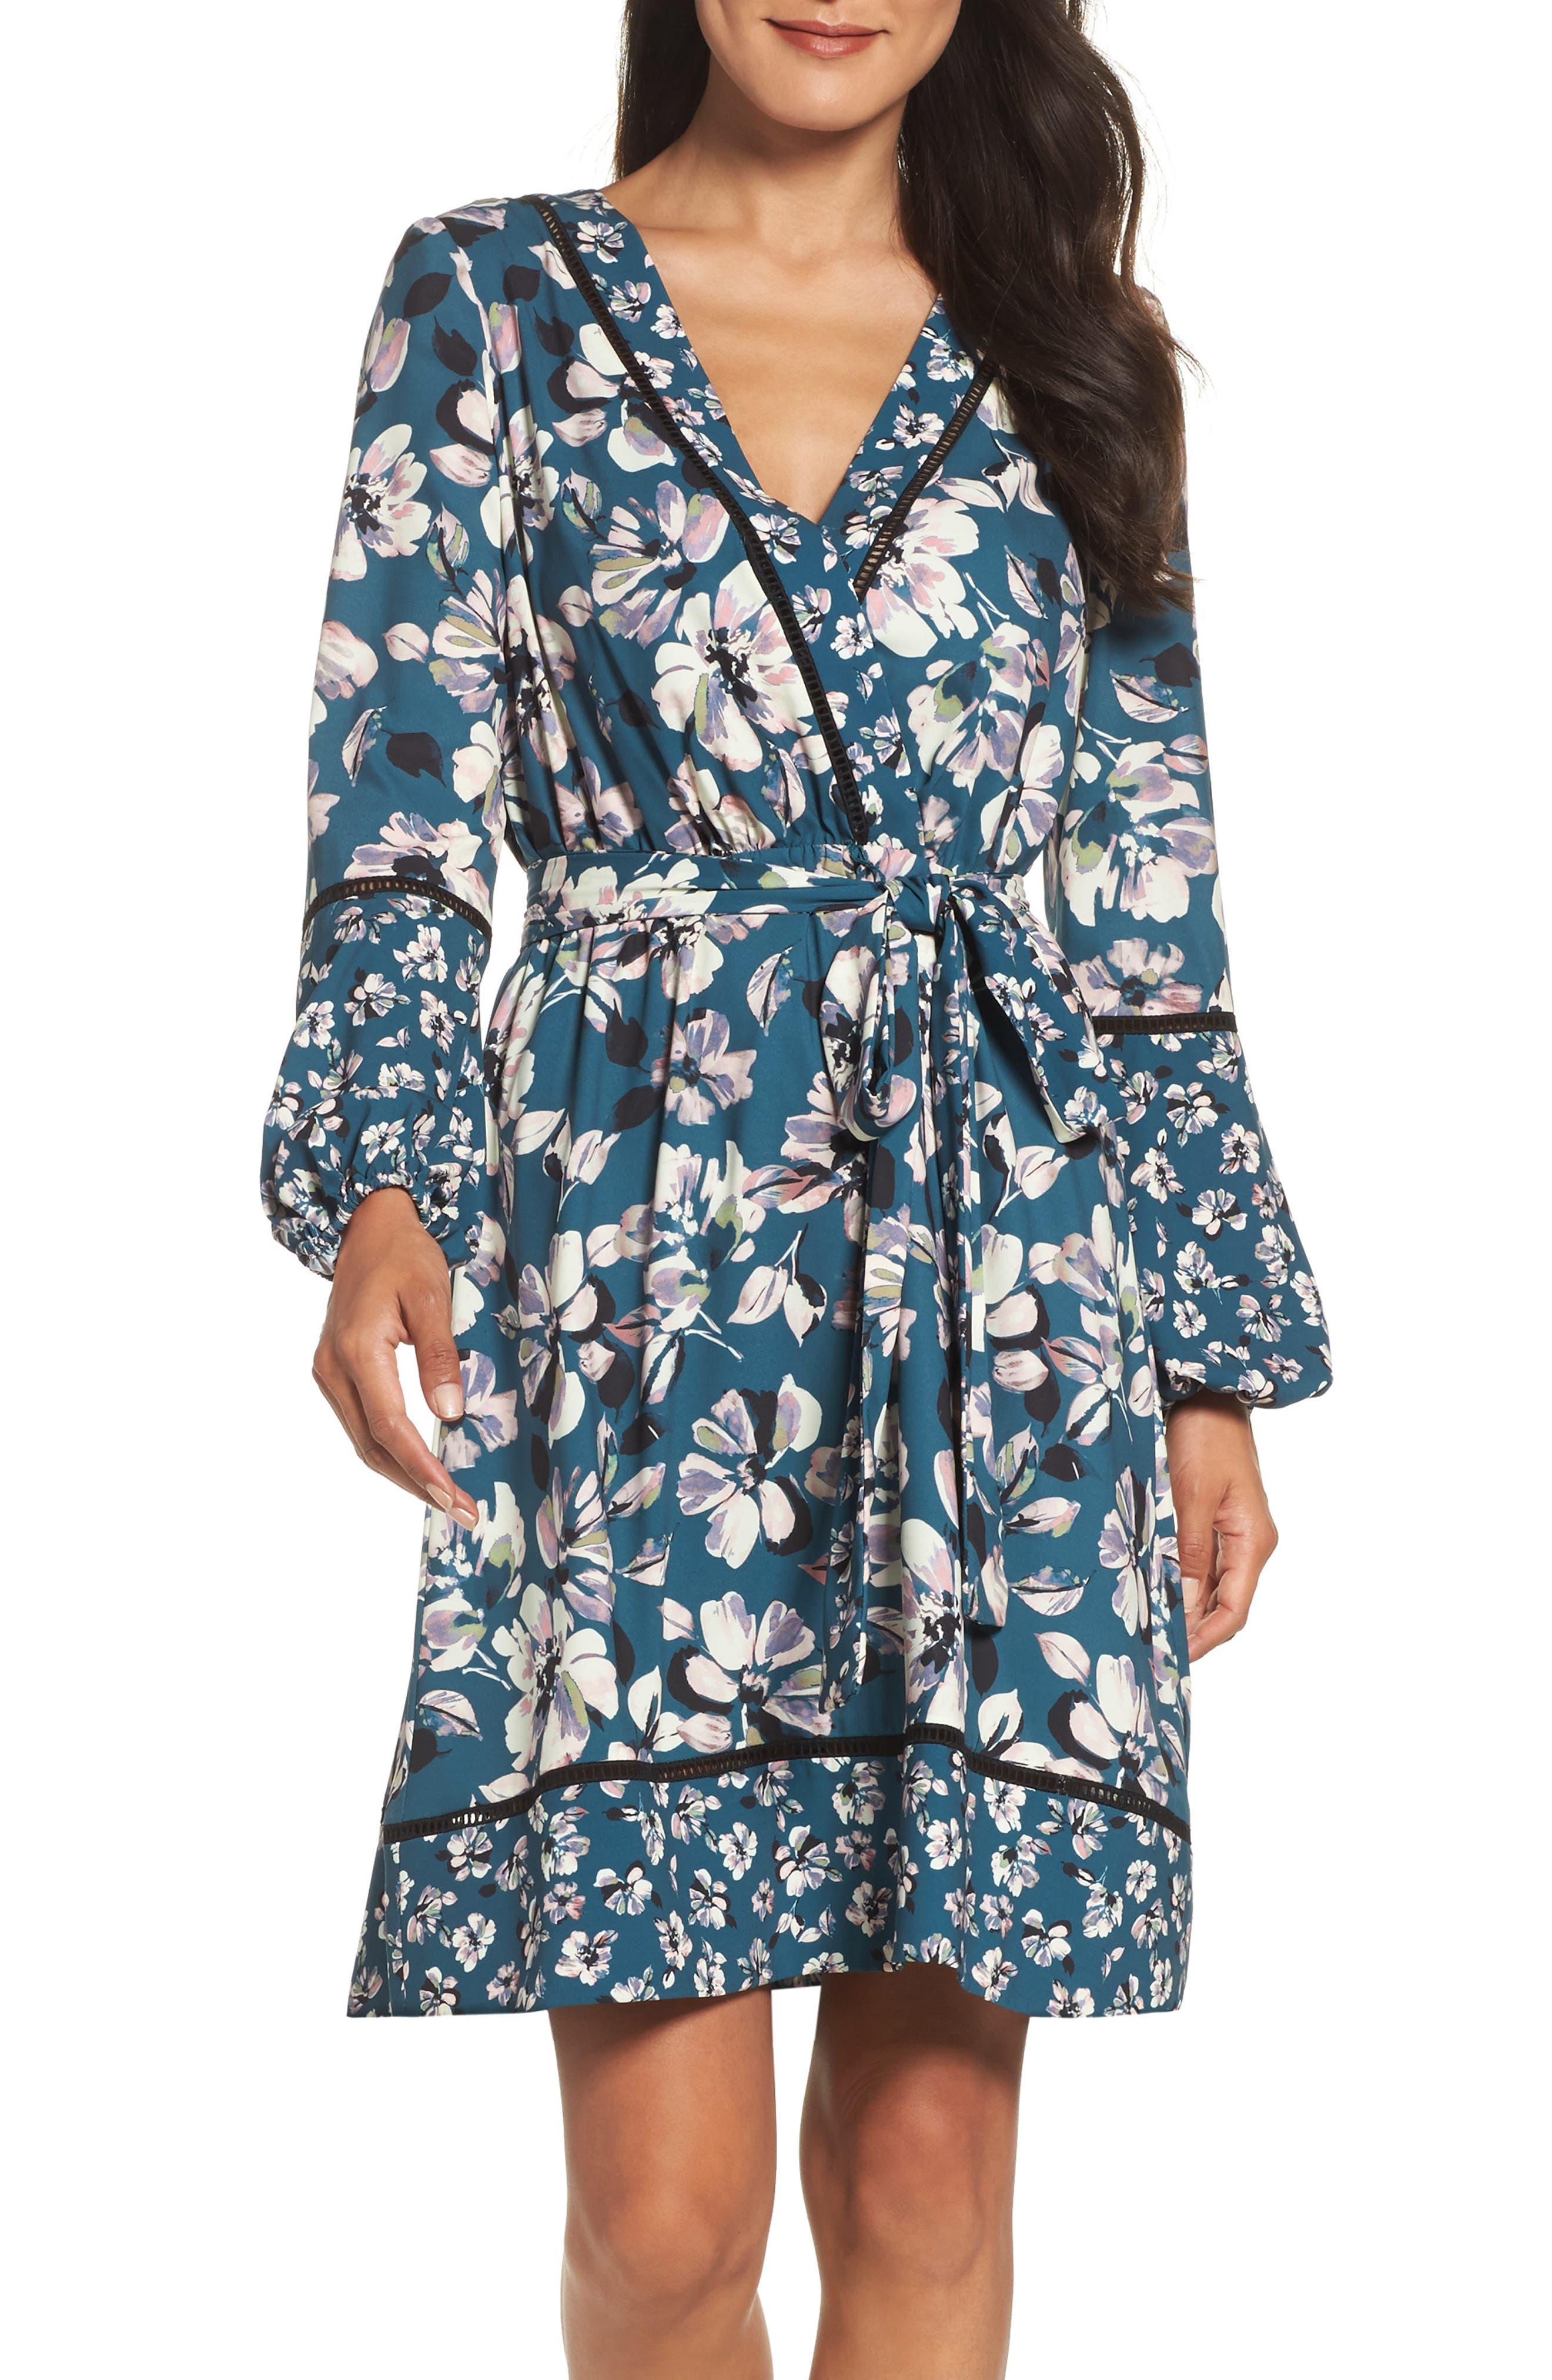 Alternate Image 1 Selected - Eliza J Print Bell Sleeve Faux Wrap Dress (Regular & Petite)